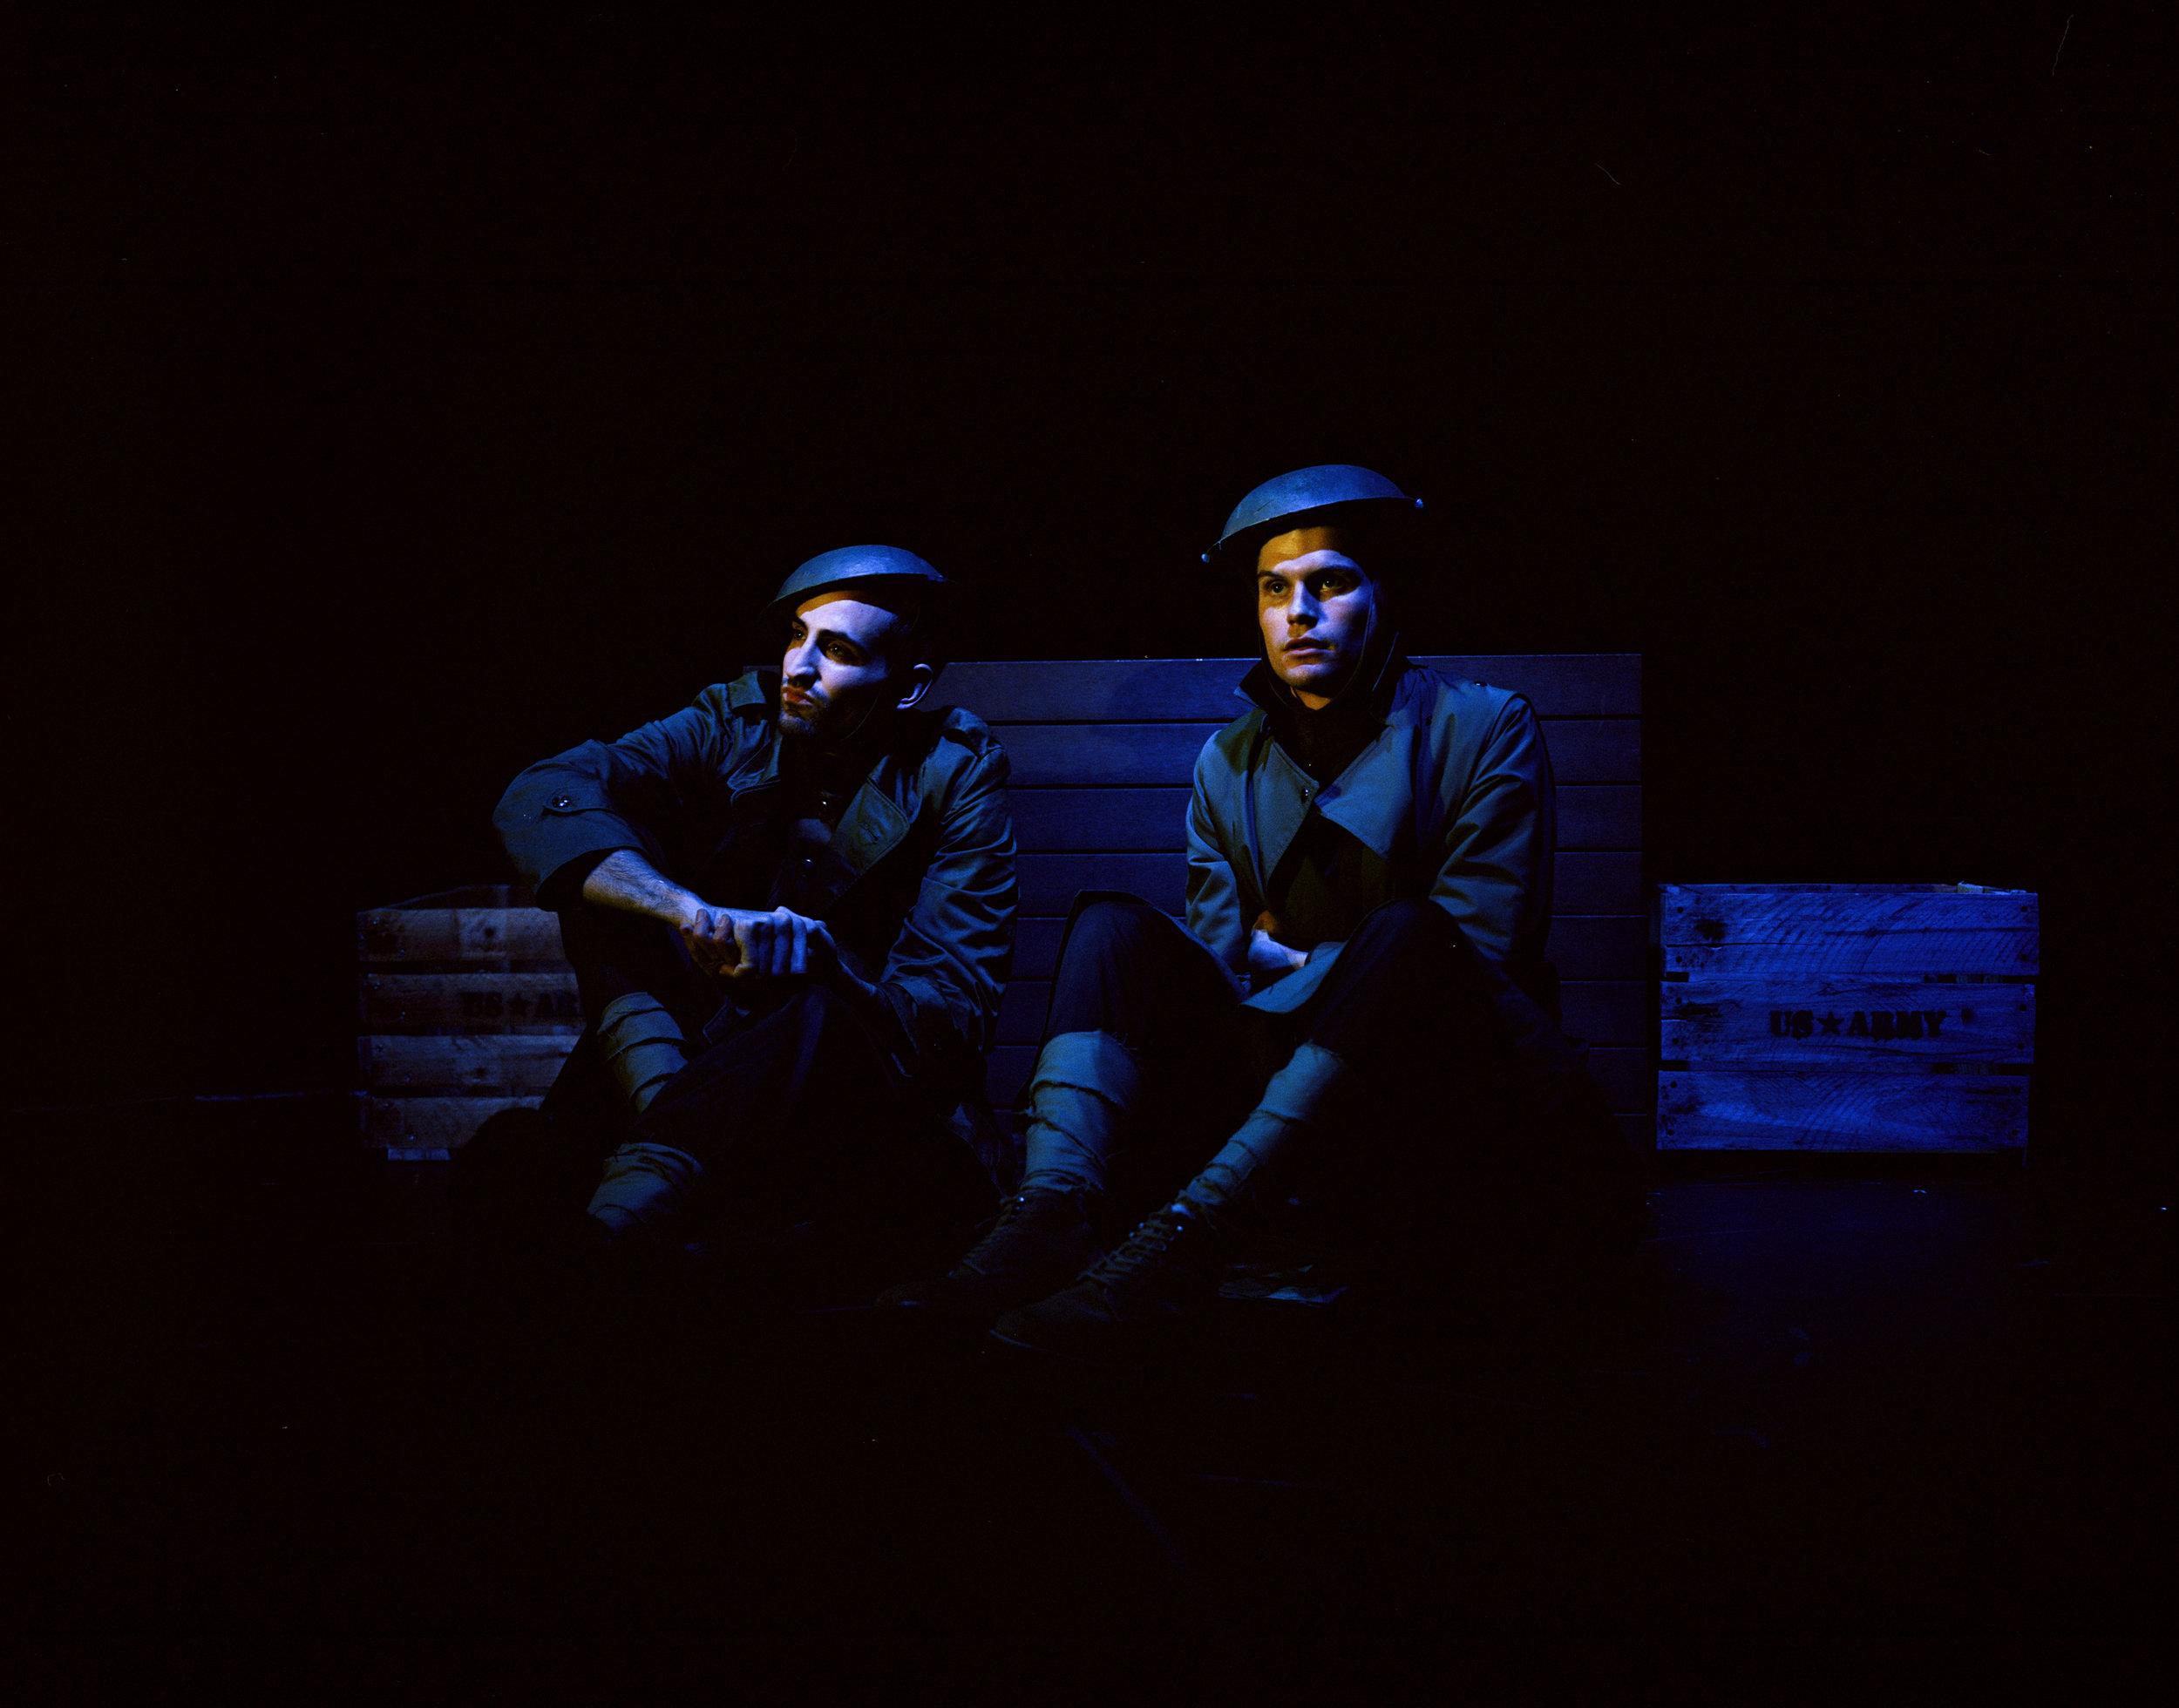 "Joe Pietropaolo as David Camper and Mackian Bauman as Burt Smith in a dress rehearsal for ""Sources of Light Other Than the Sun""  dir. Sam Hood Adrain  6x7 Kodak Portra (Medium Format)"